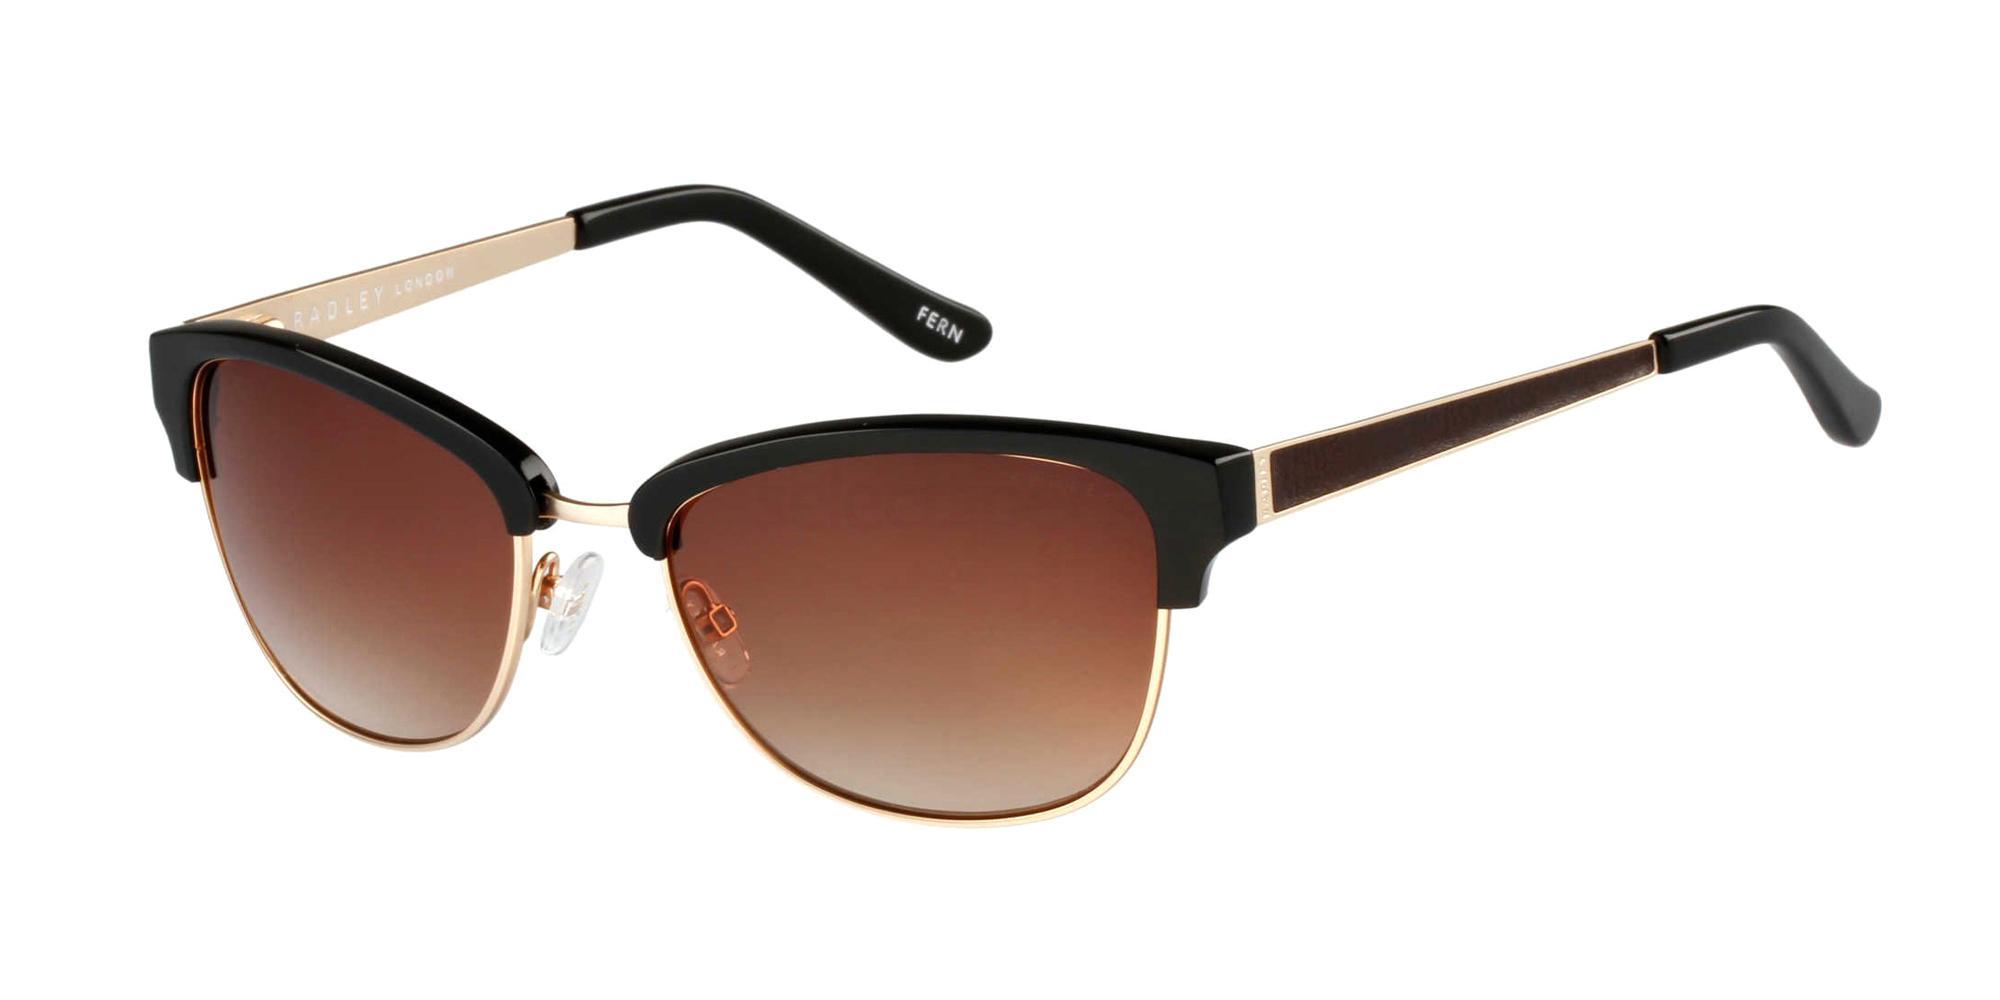 104 RDS-FERN Sunglasses, Radley London